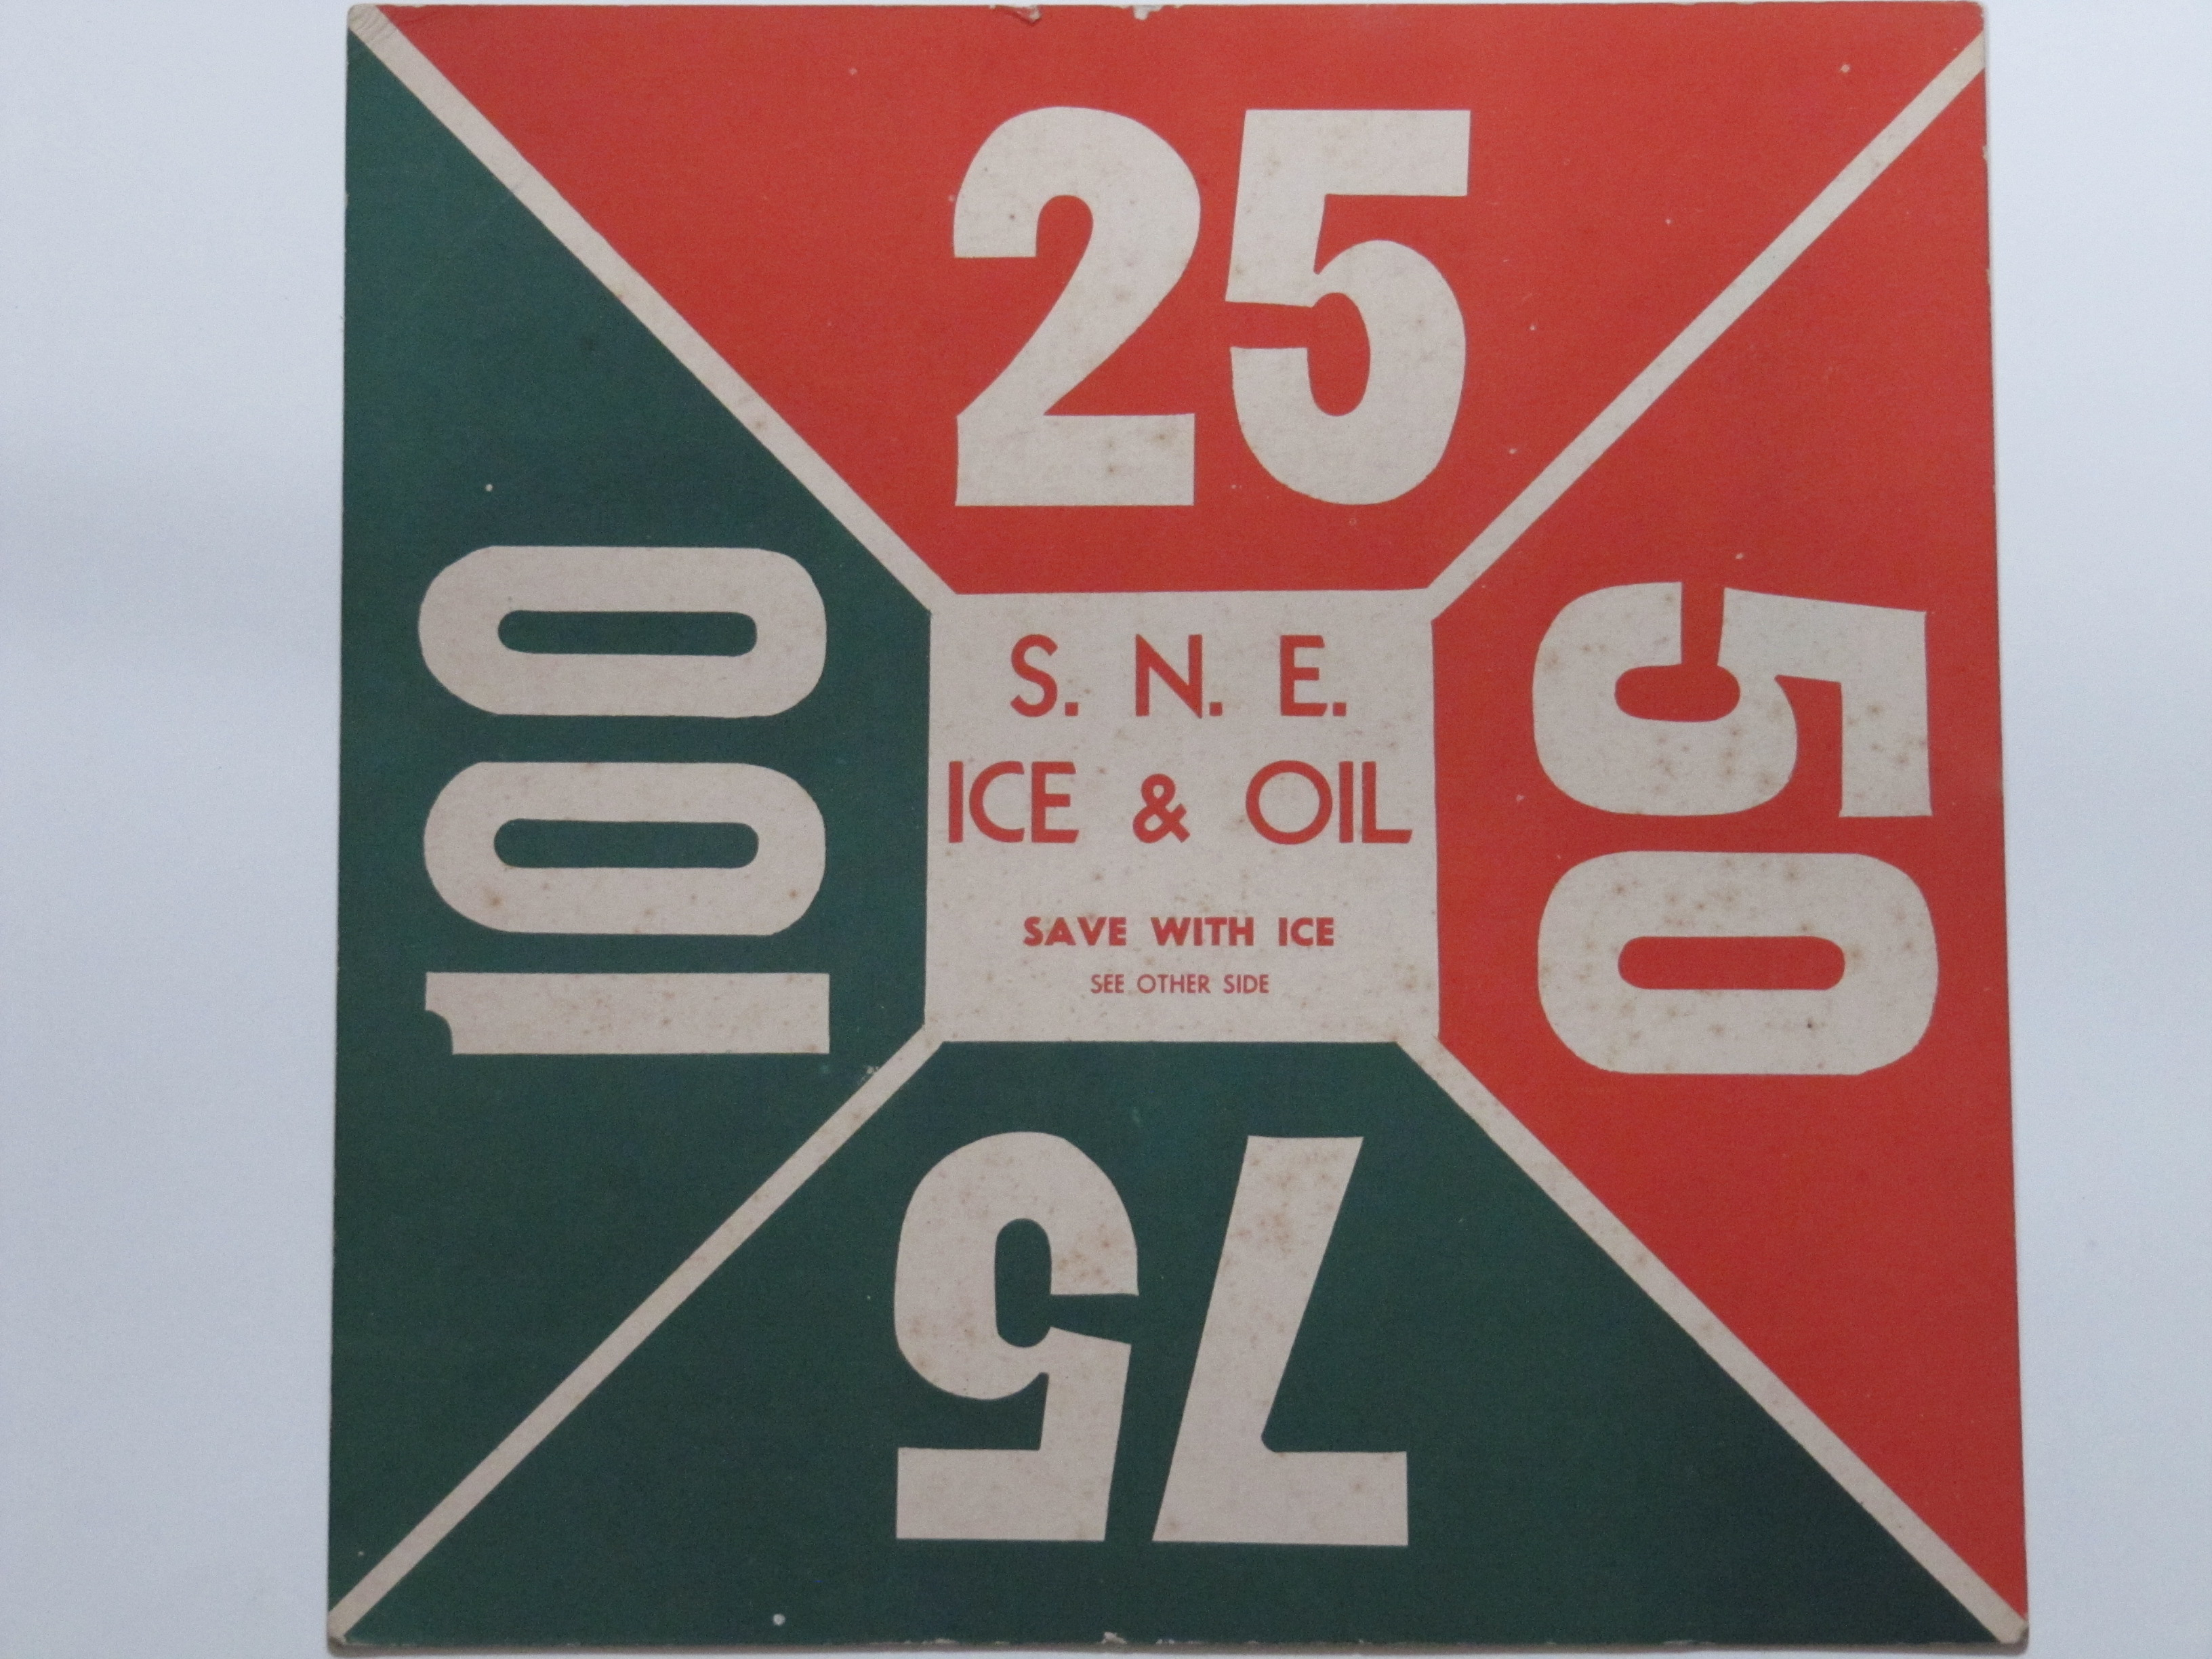 S.N.E.Ice Co.